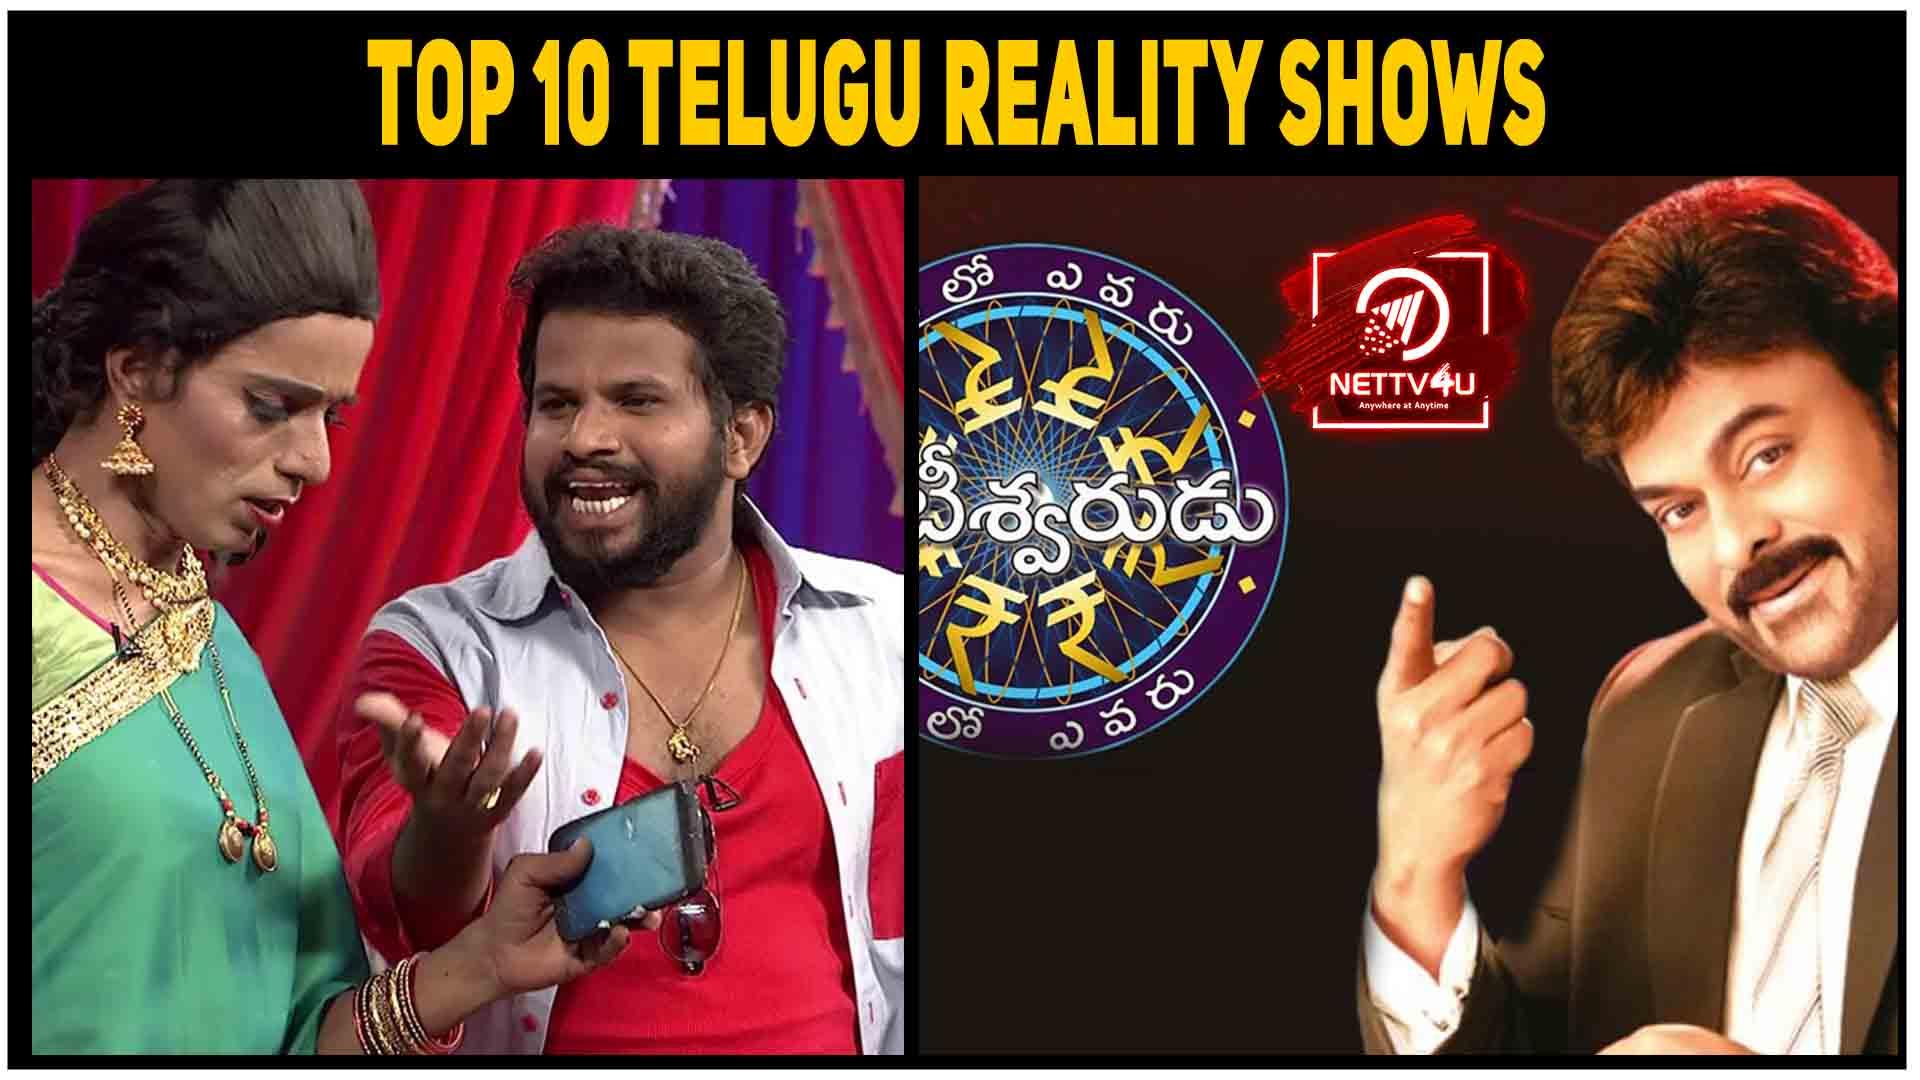 Top 10 Telugu Reality Shows   Latest Articles   NETTV4U